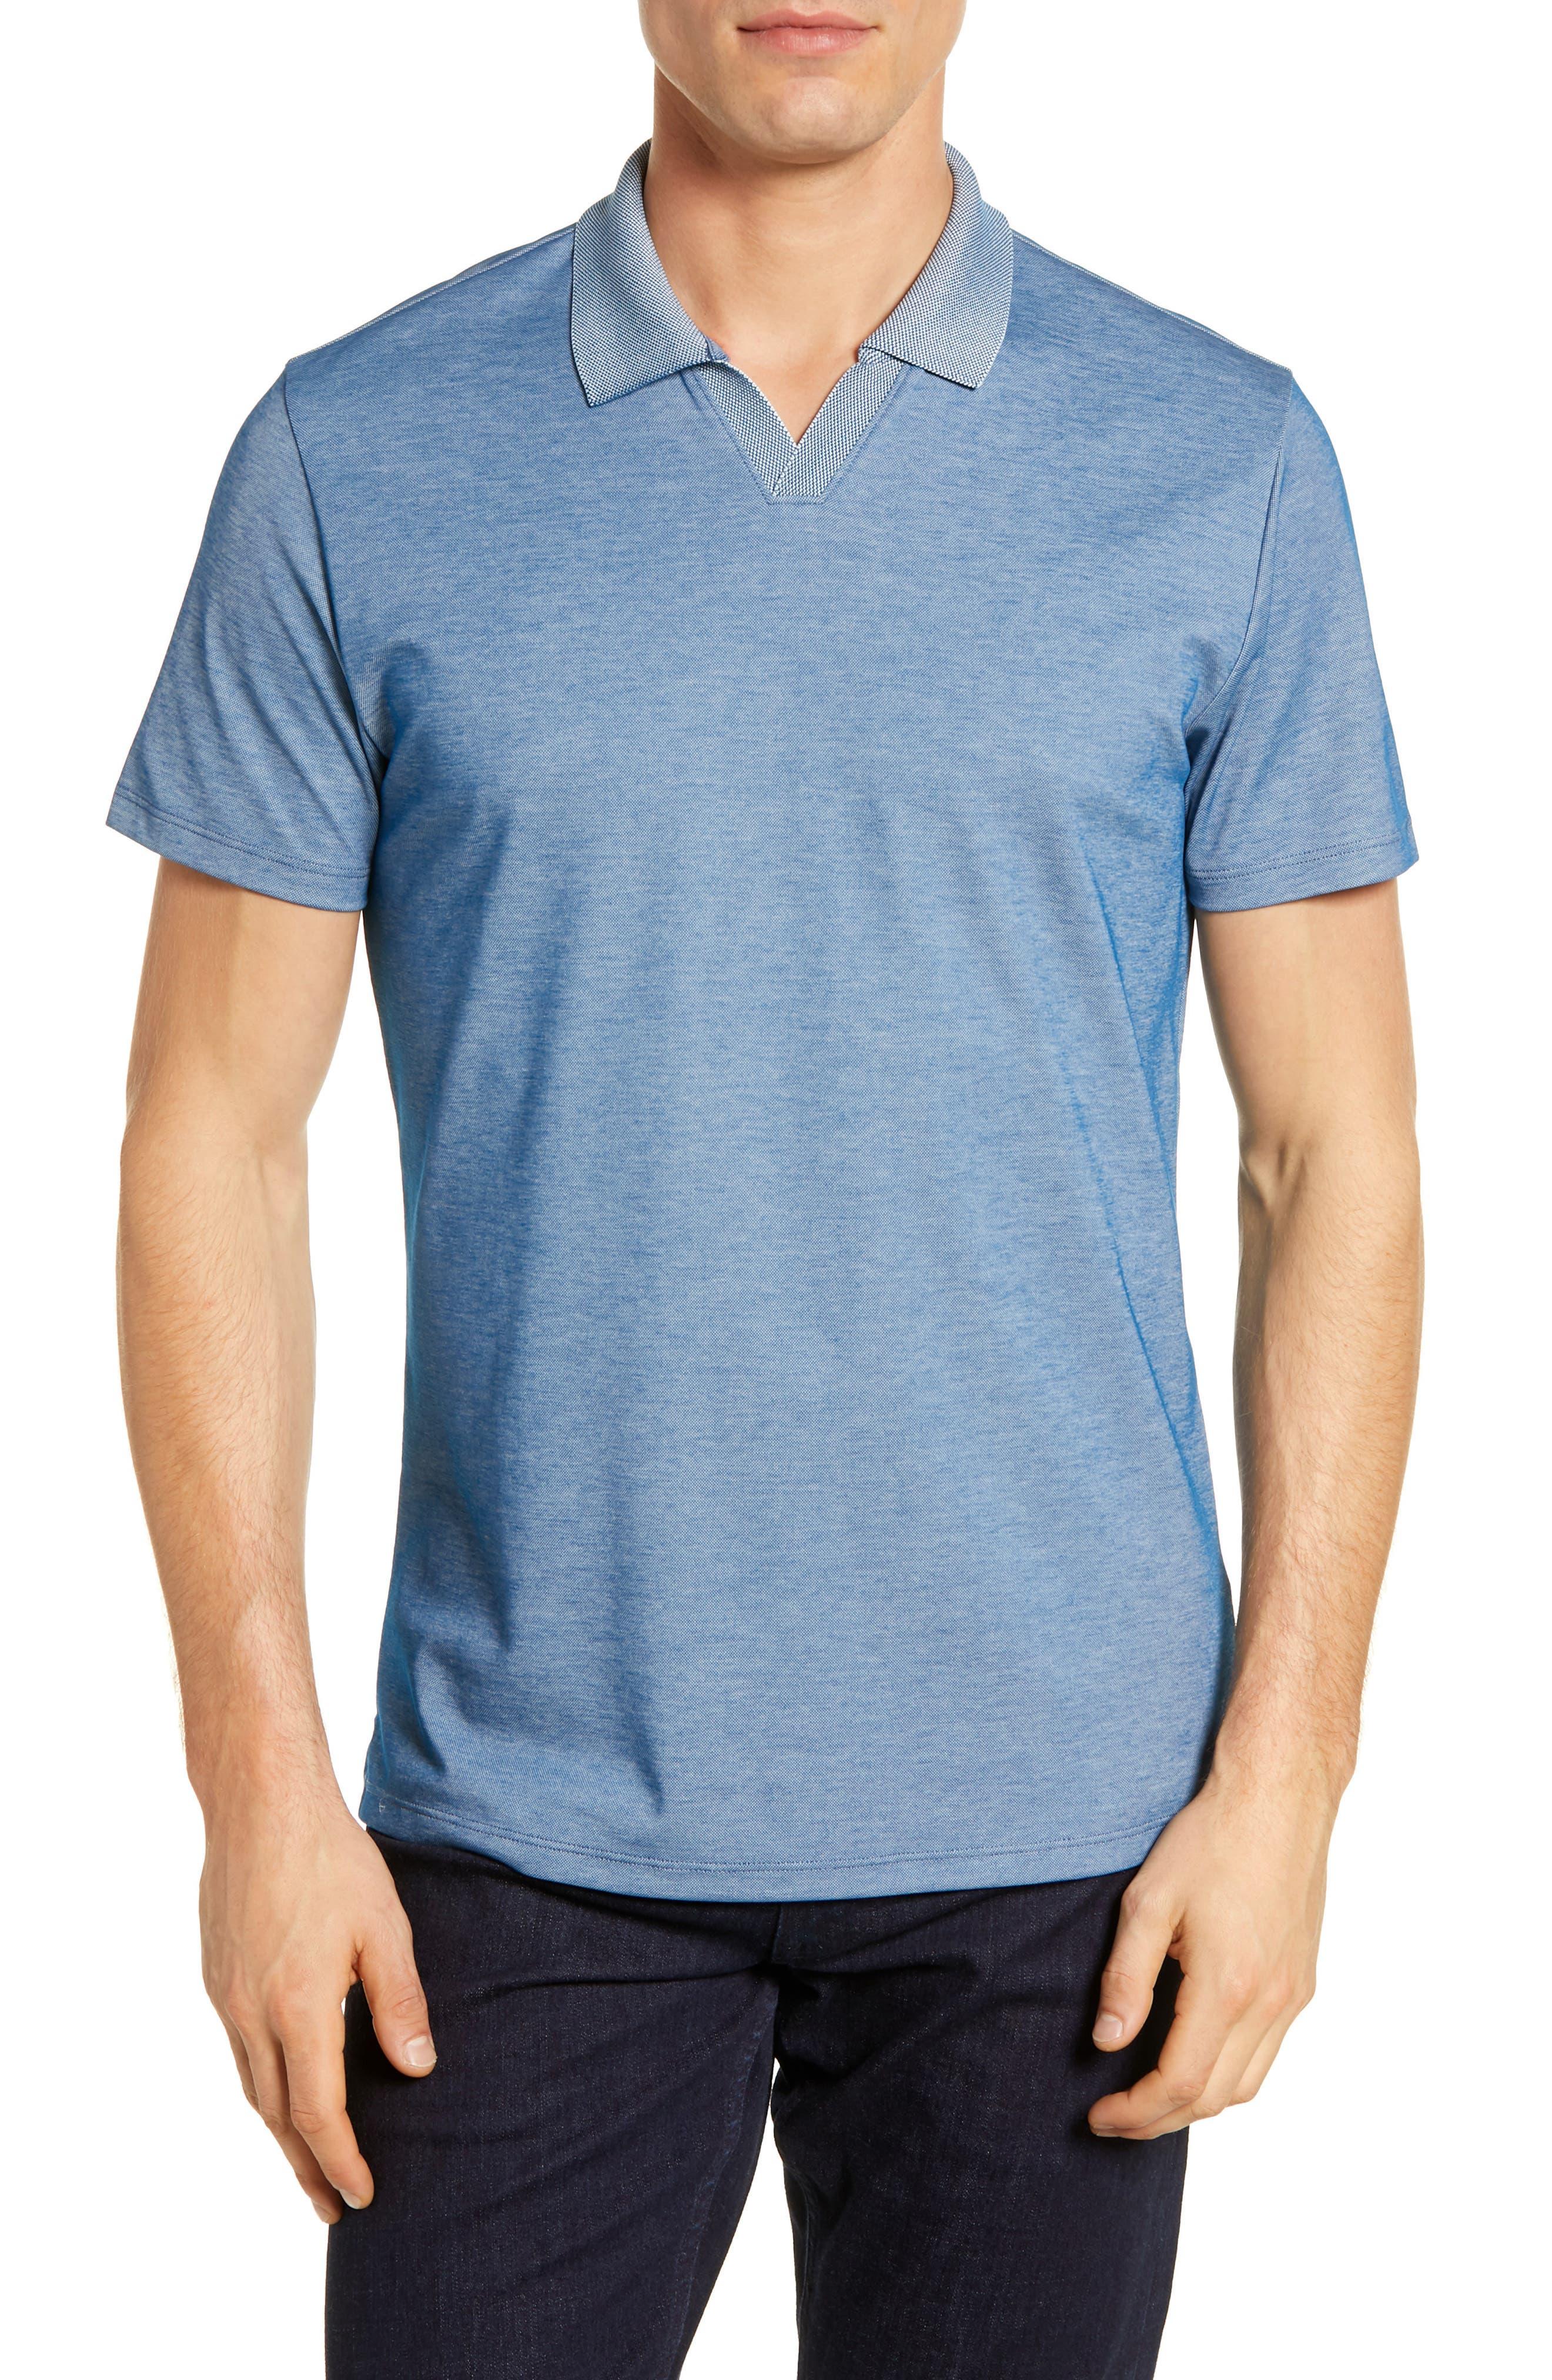 1930s Mens Shirts | Dress Shirts, Polo Shirts, Work Shirts Mens Robert Barakett Casey Johnny Collar Polo Size Large - Blue $95.00 AT vintagedancer.com